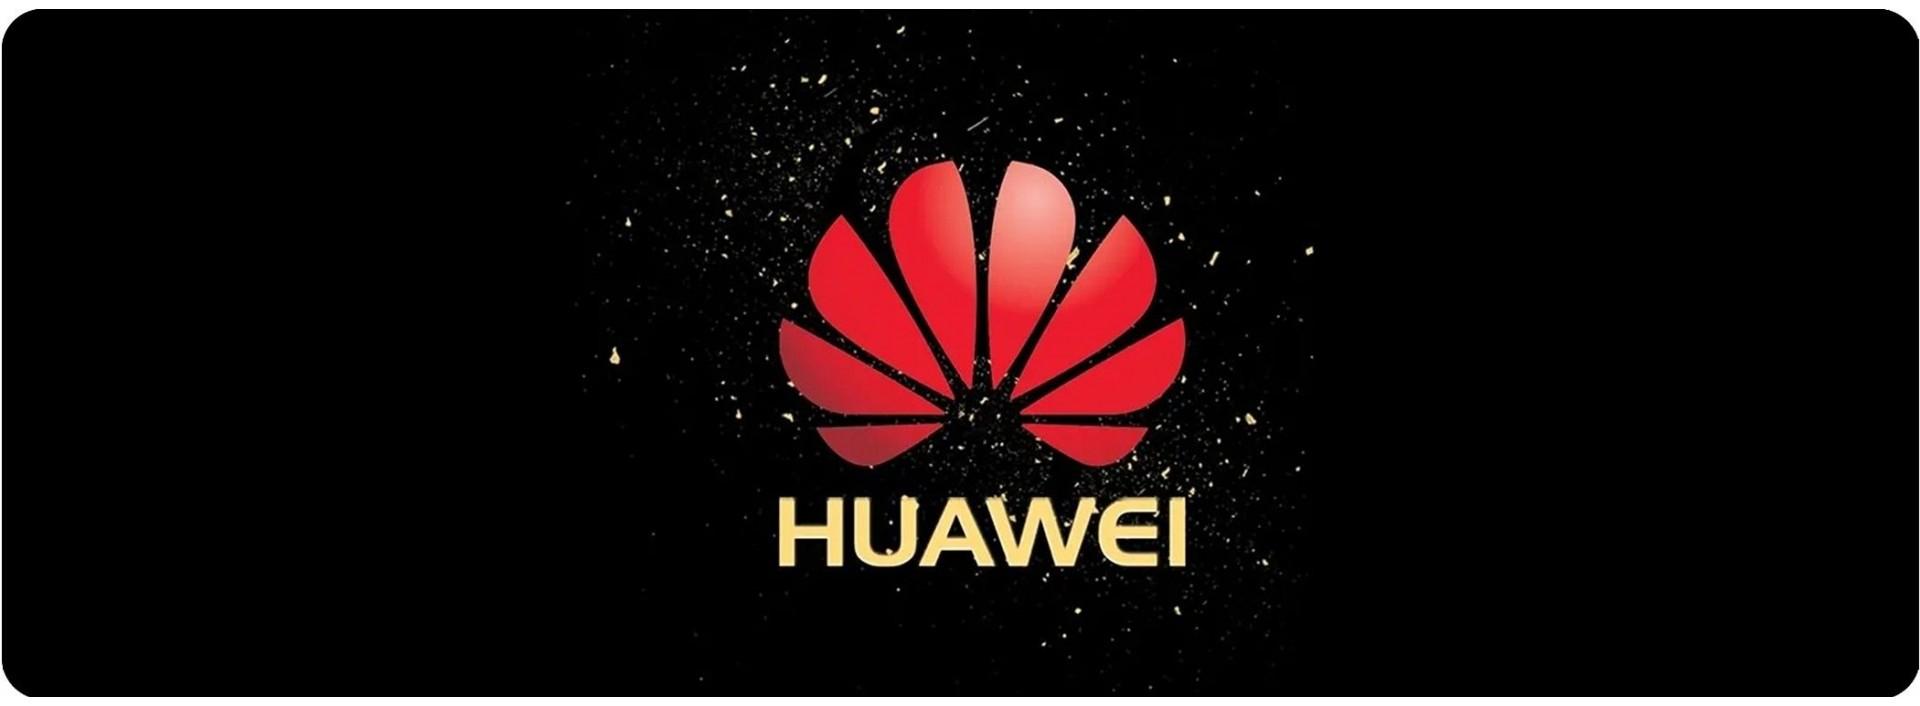 Fundas para Huawei | TuMundoSmartphone | Envio Gratis